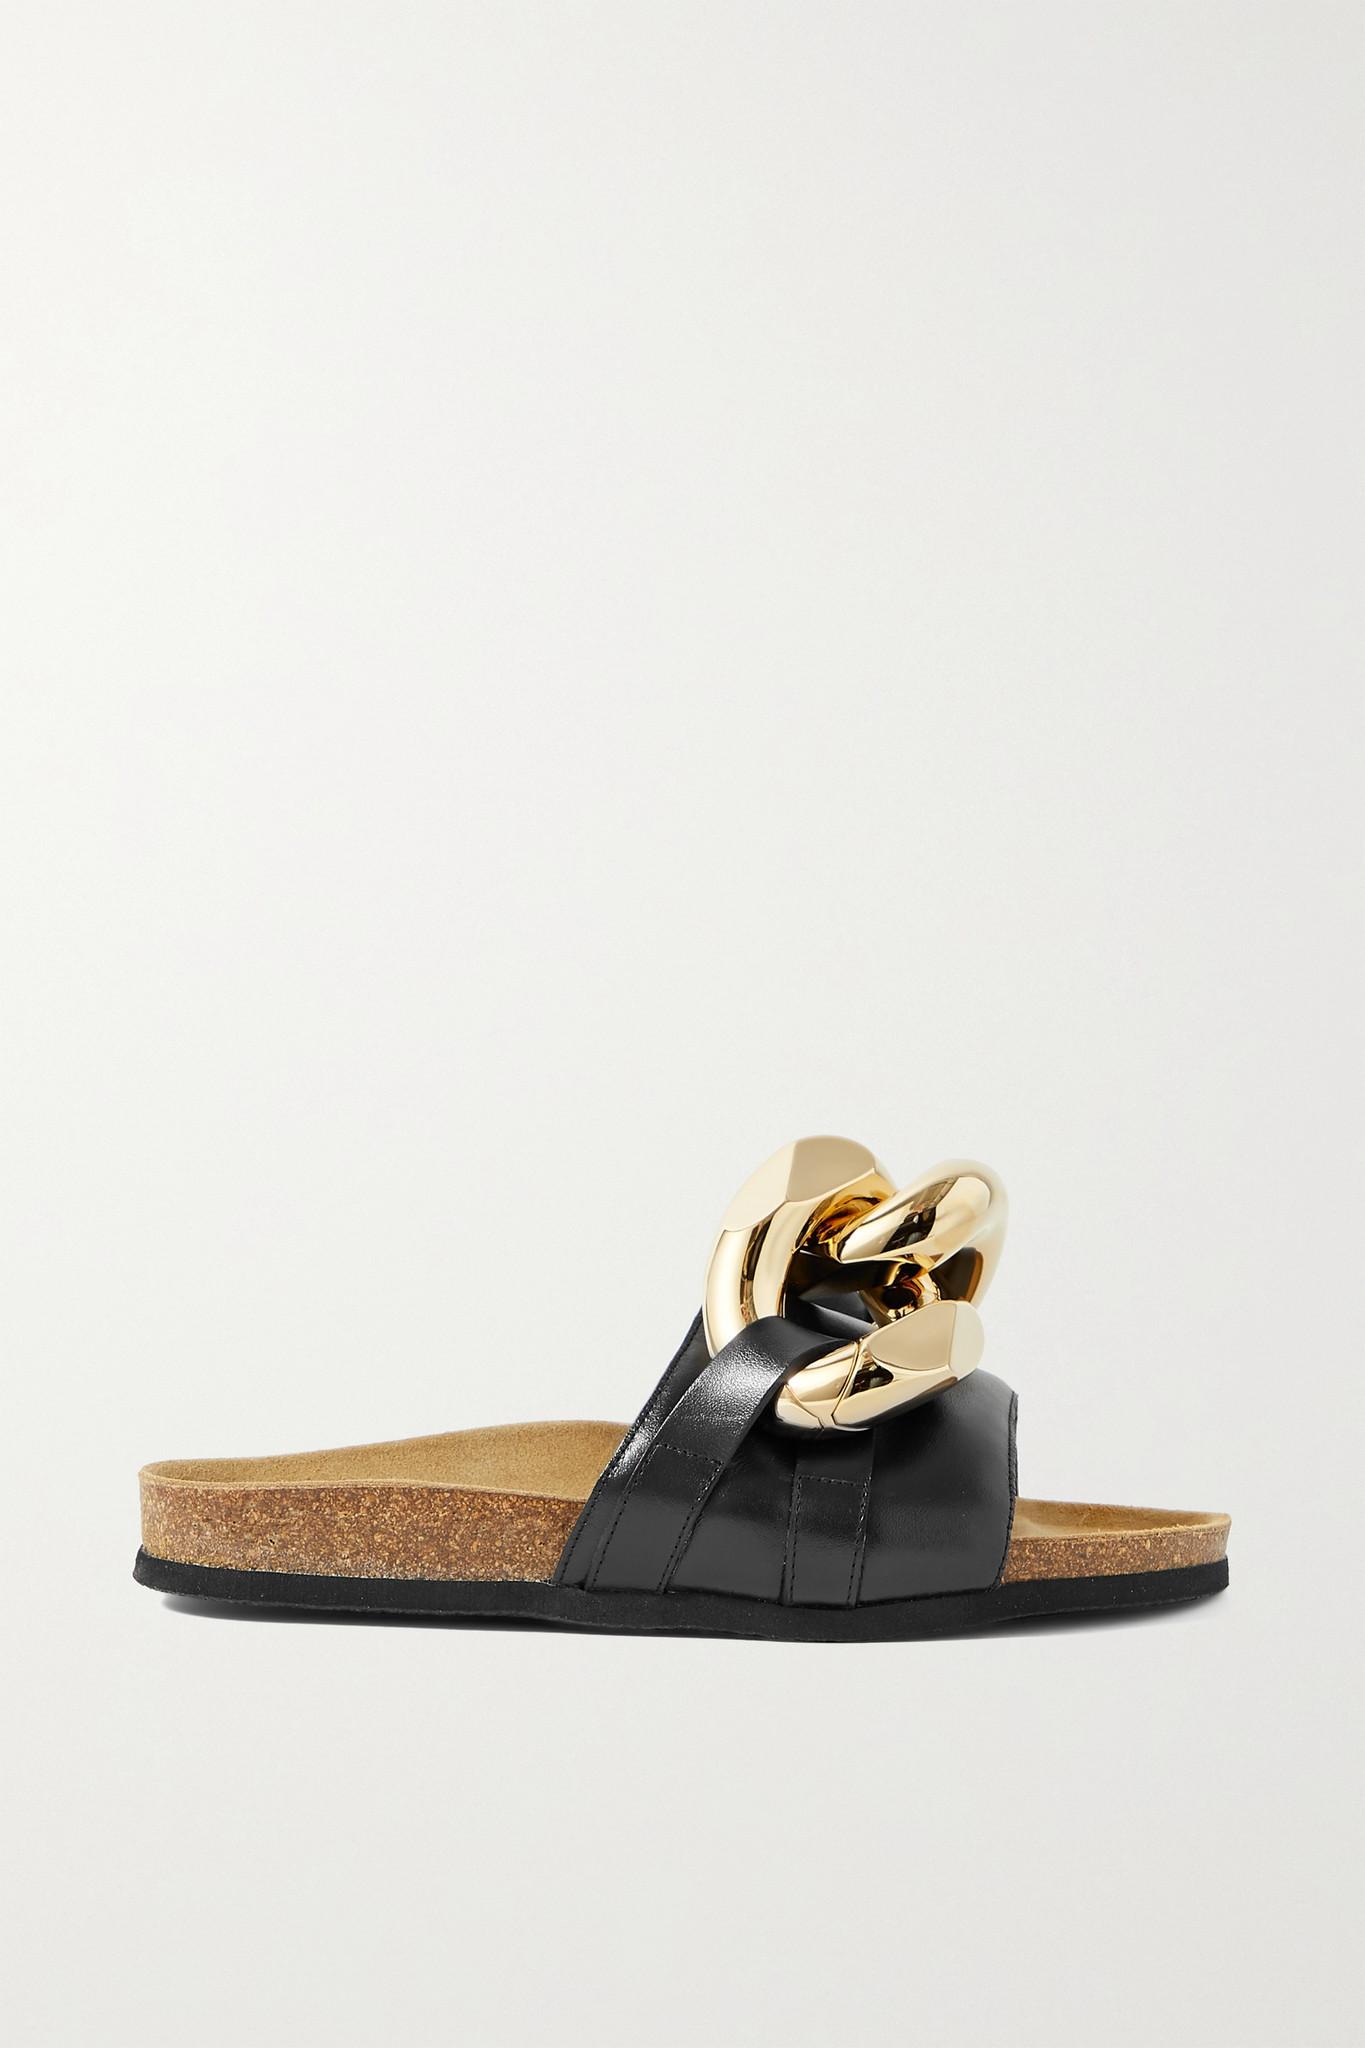 JW ANDERSON - Chain-embellished Leather Slides - Black - IT35